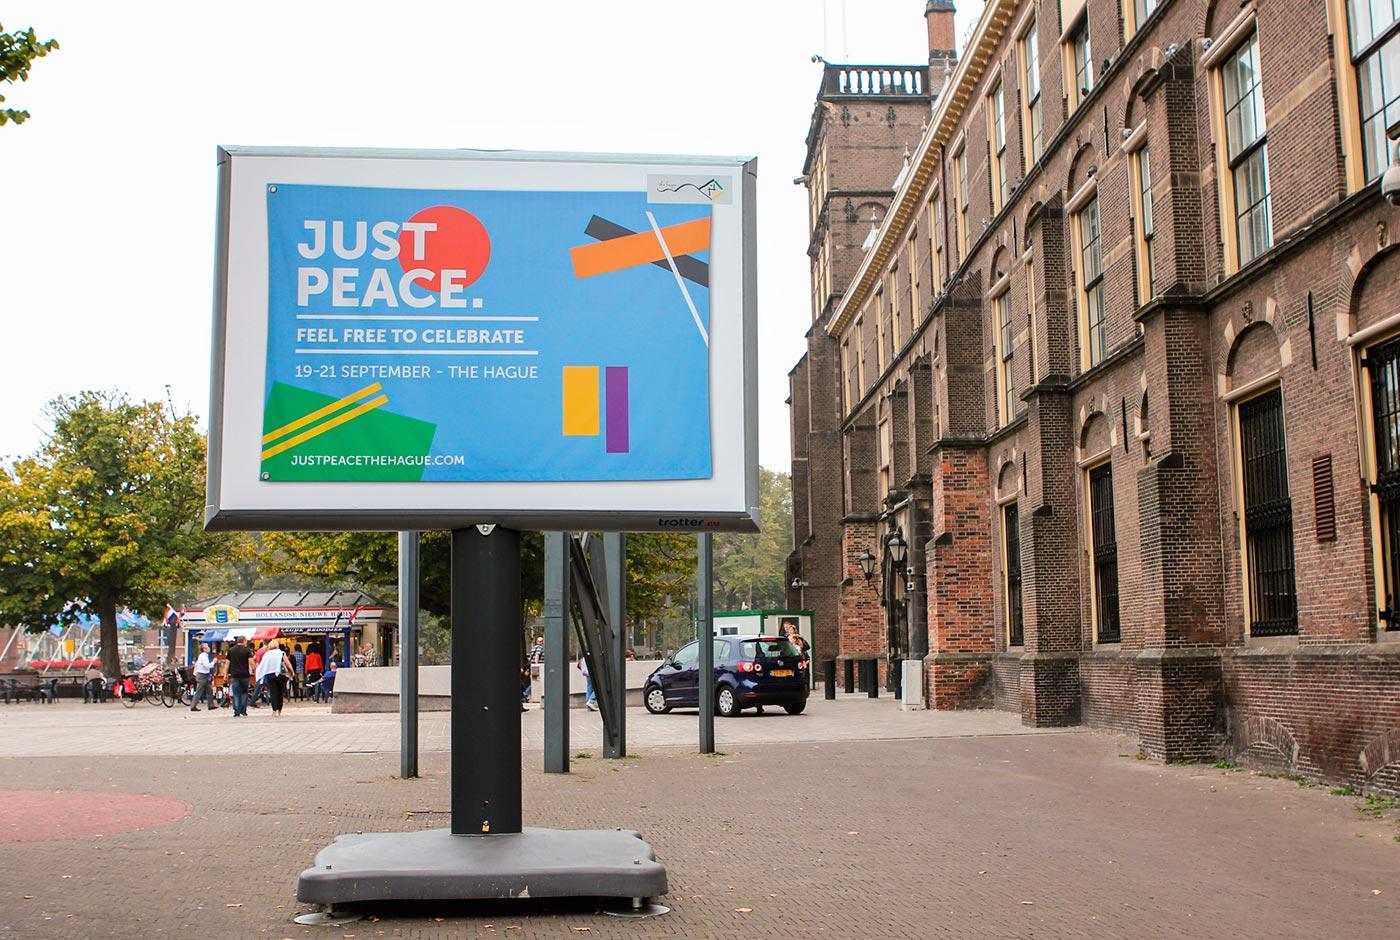 Just peace Identity